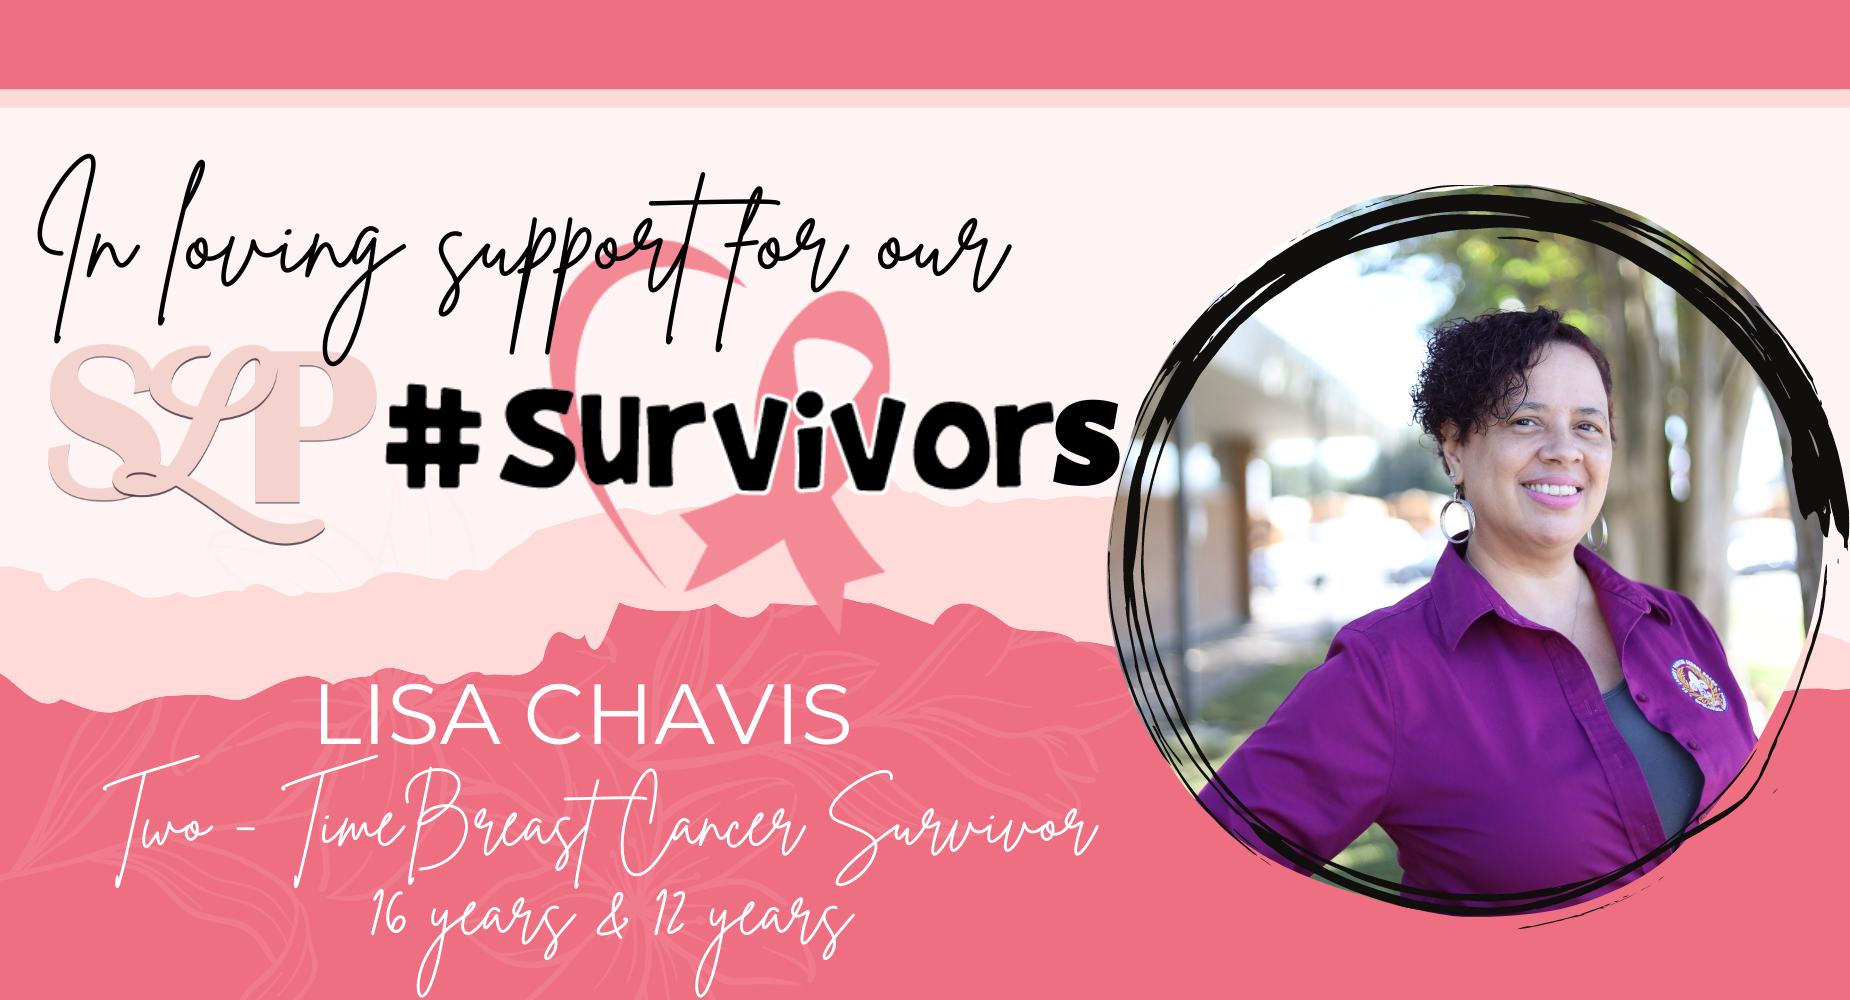 LISA CHAVIS TWO TIME BREAST CANCER SURVIVOR